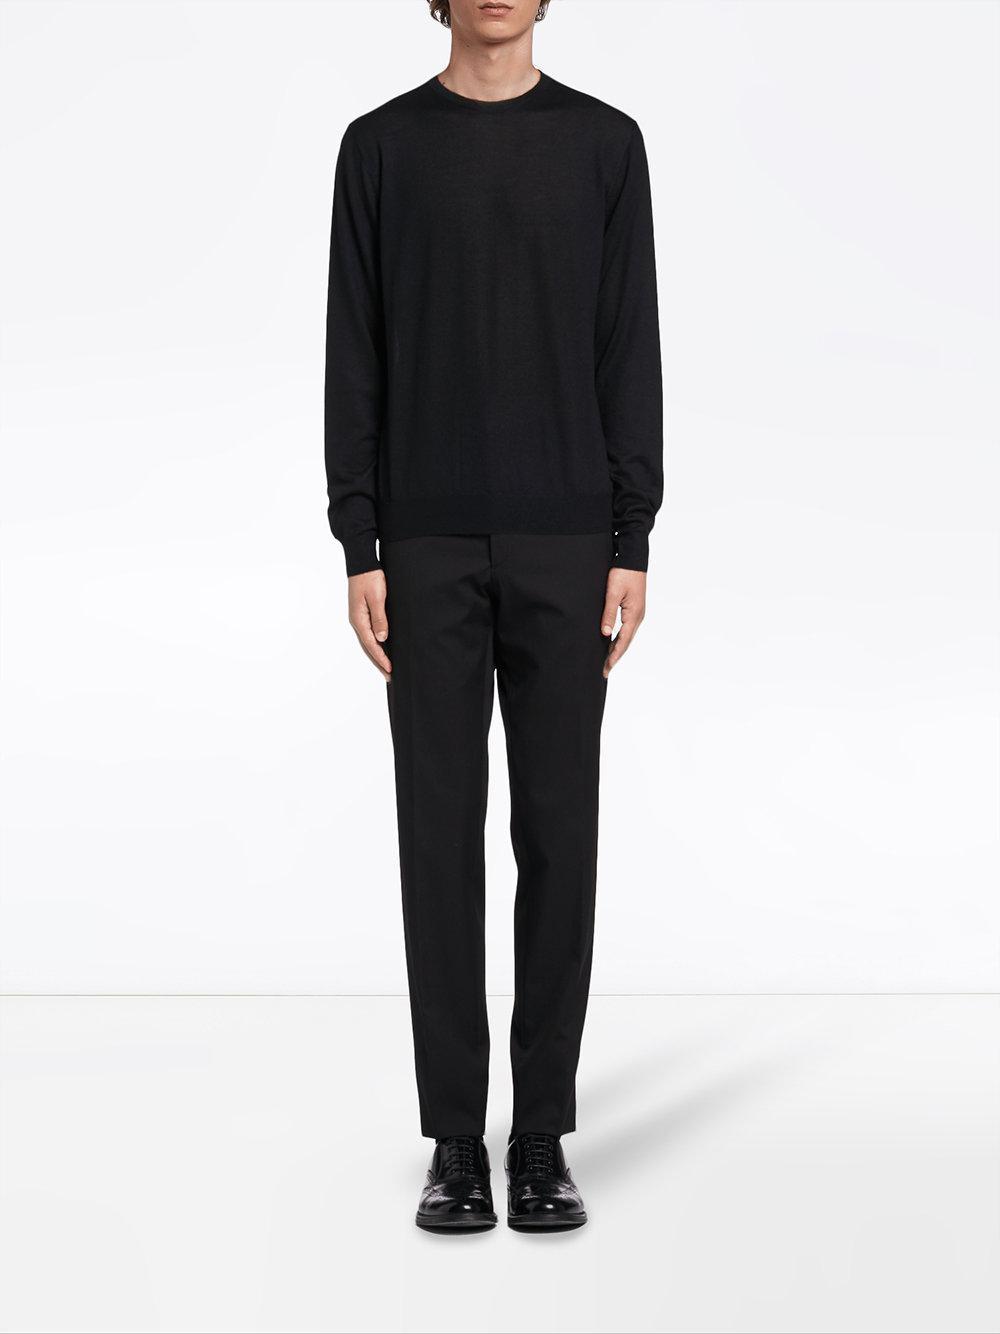 f7c518cdece1 Lyst - Prada Knitted Crew Neck Sweater in Black for Men